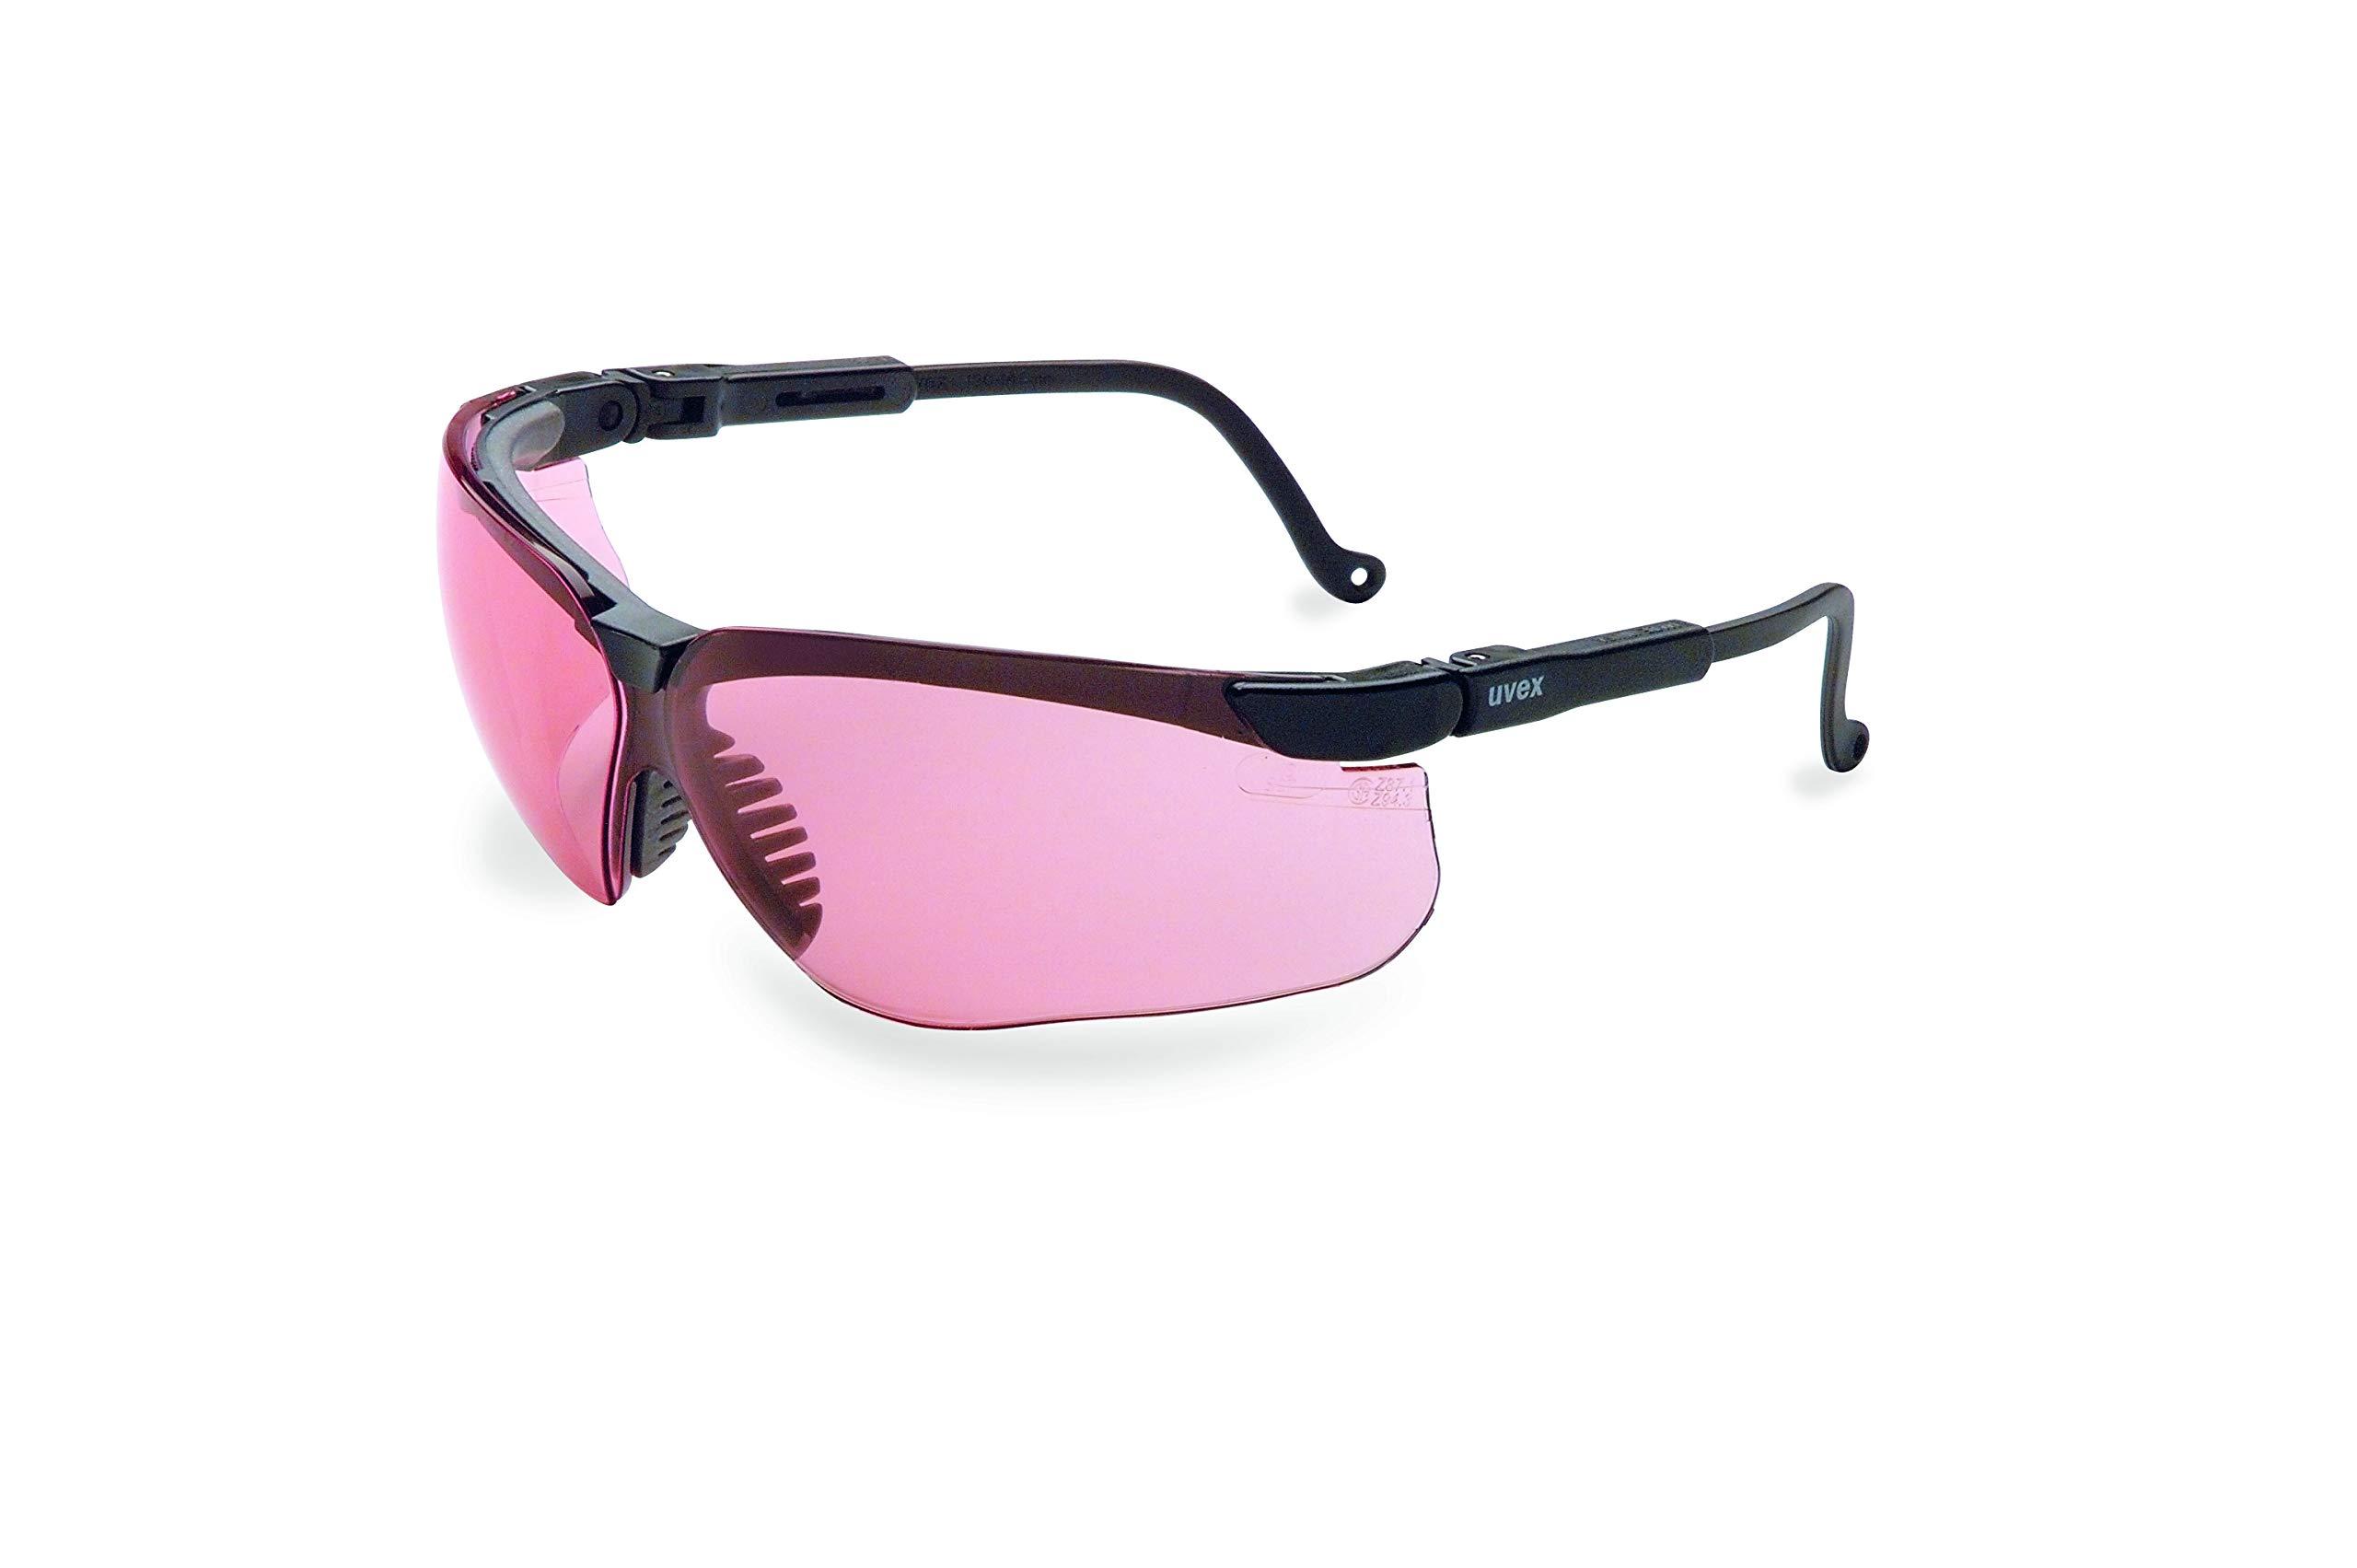 UVEX by Honeywell - S3210X Uvex by Honeywell Genesis Safety Glasses with Uvextreme Anti-Fog Coating, Black Frame